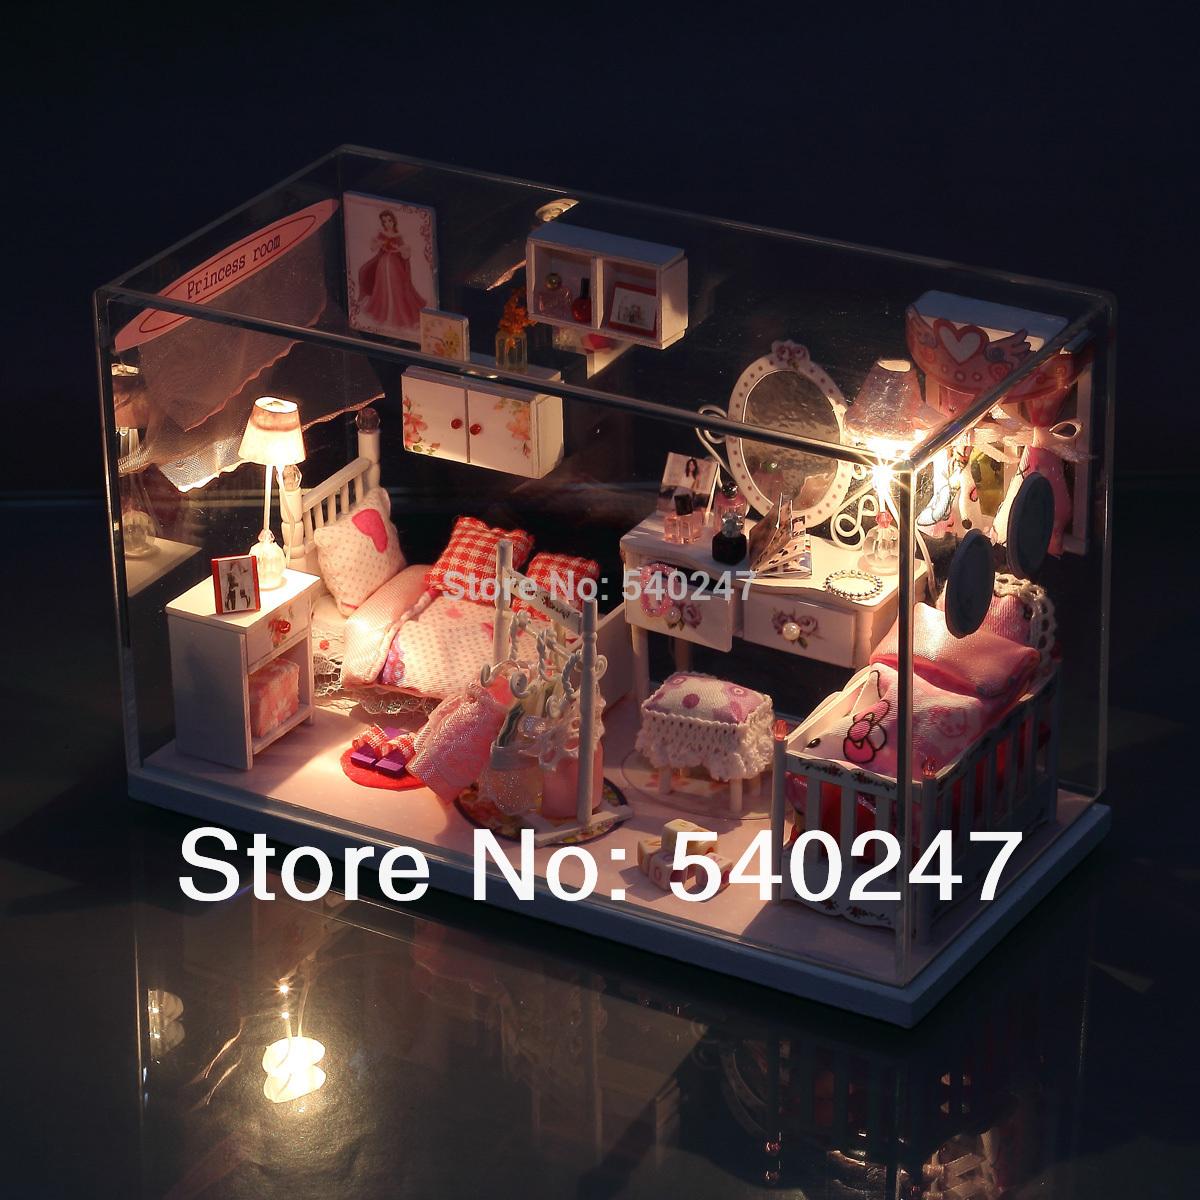 http://i01.i.aliimg.com/wsphoto/v0/1717700491_1/Small-gift-birthday-gift-font-b-ideas-b-font-white-valentine-s-day-girls-boyfriend-girlfriends.jpg